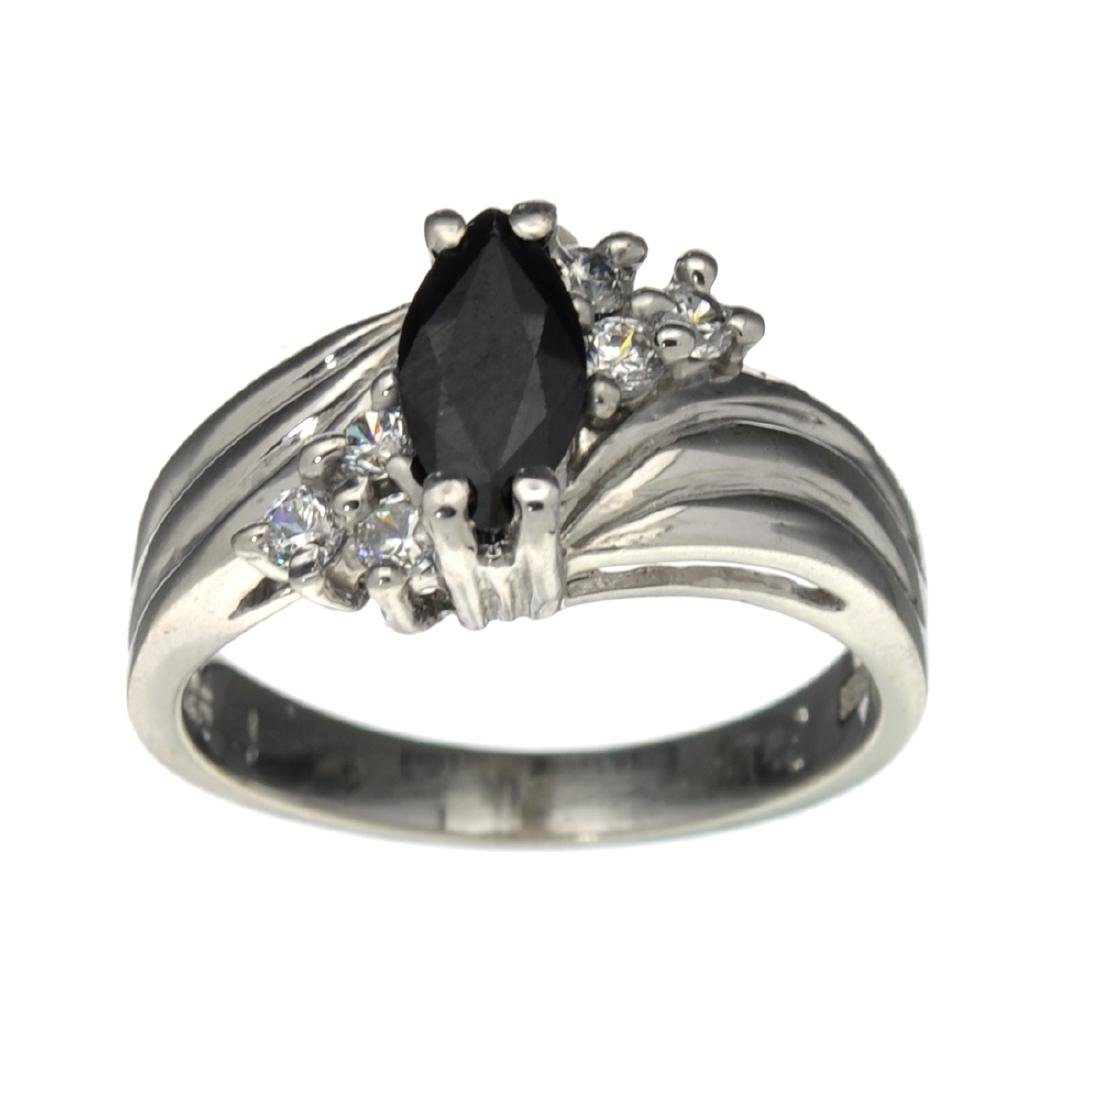 APP: 0.5k Fine Jewelry Designer Sebastian, 1.20CT